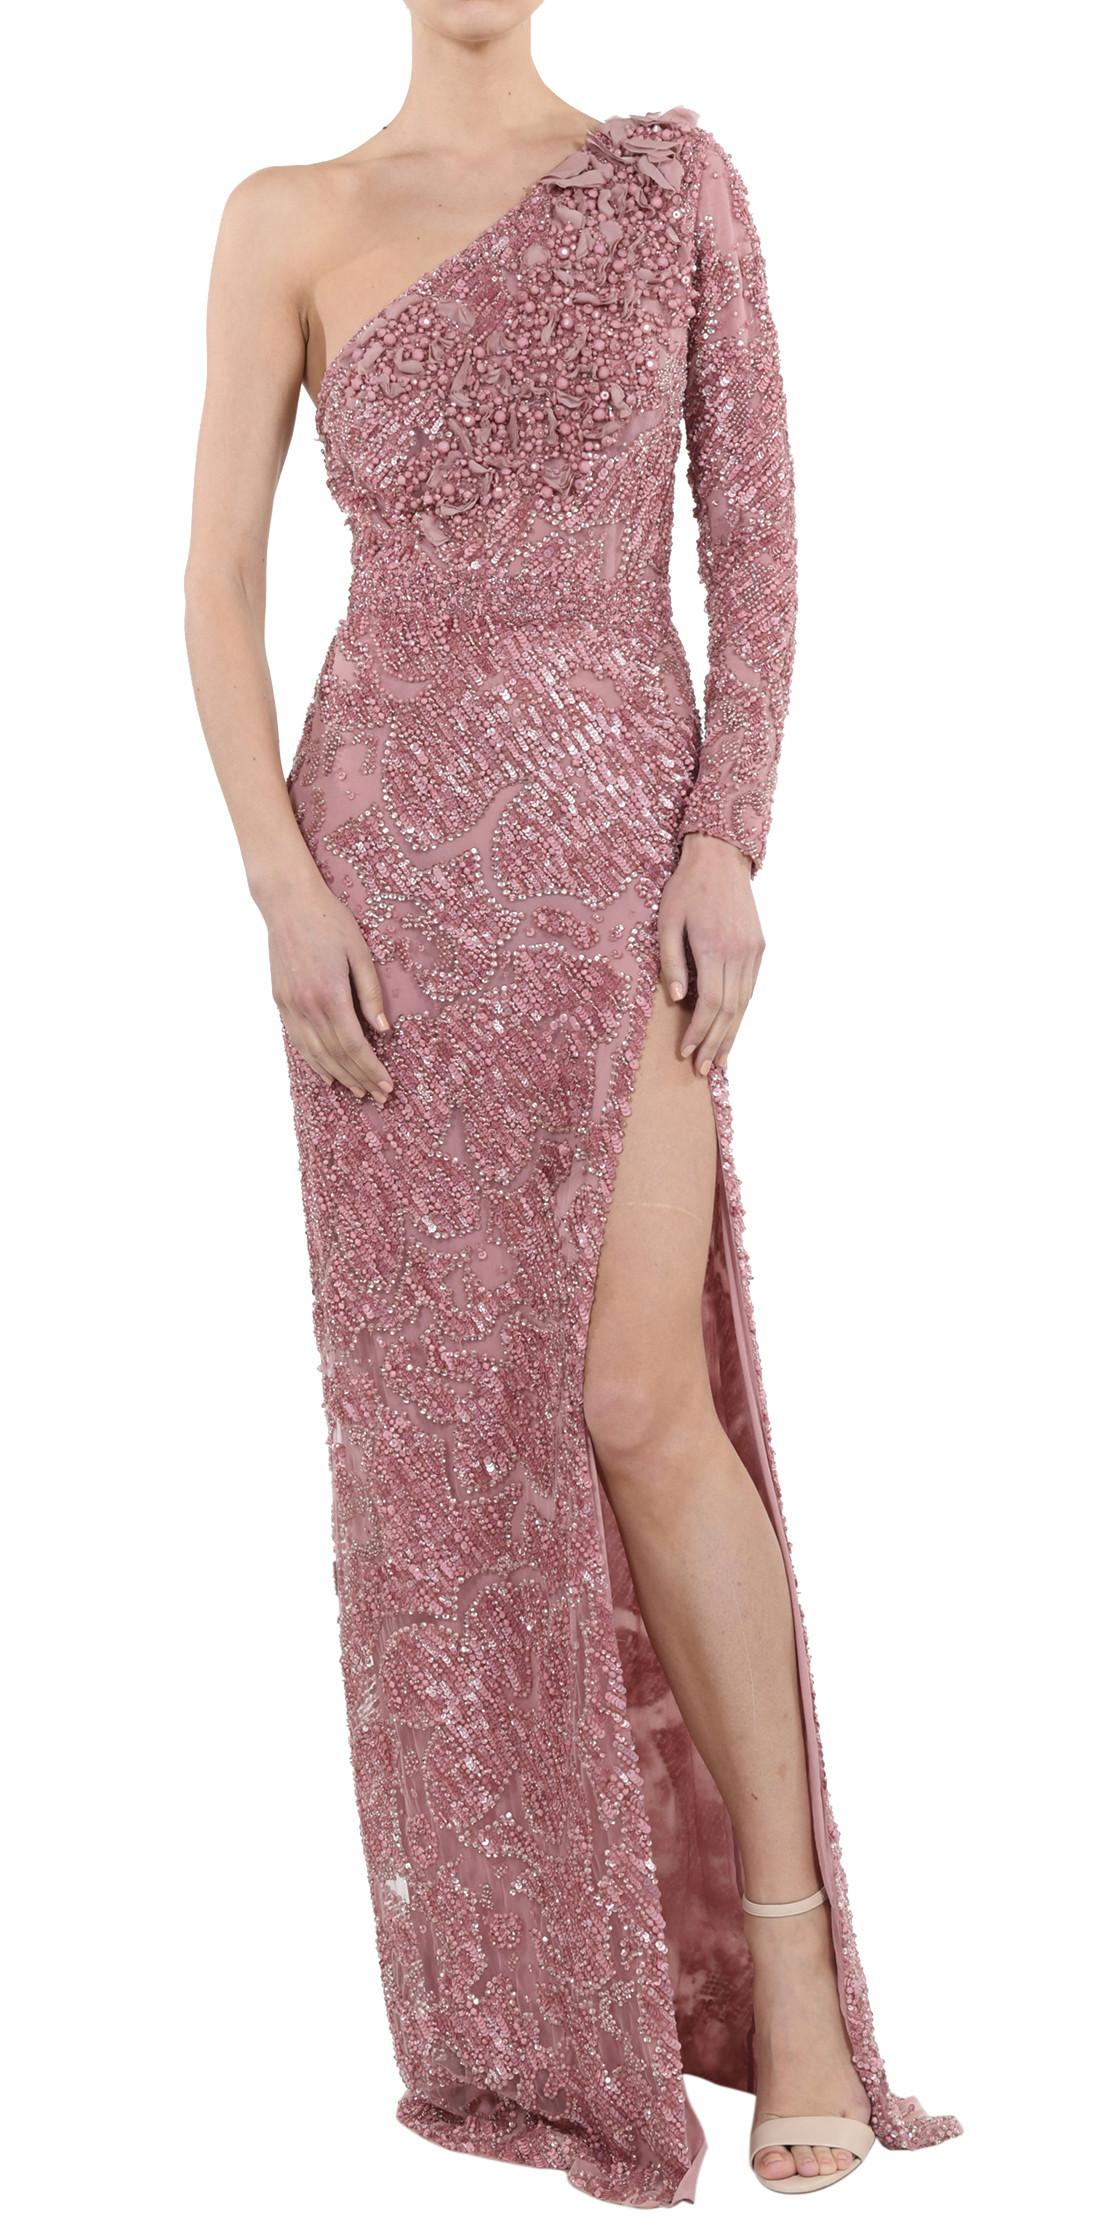 Elie Saab Embellished Asymmetric Gown | Evening Dress Rental ...